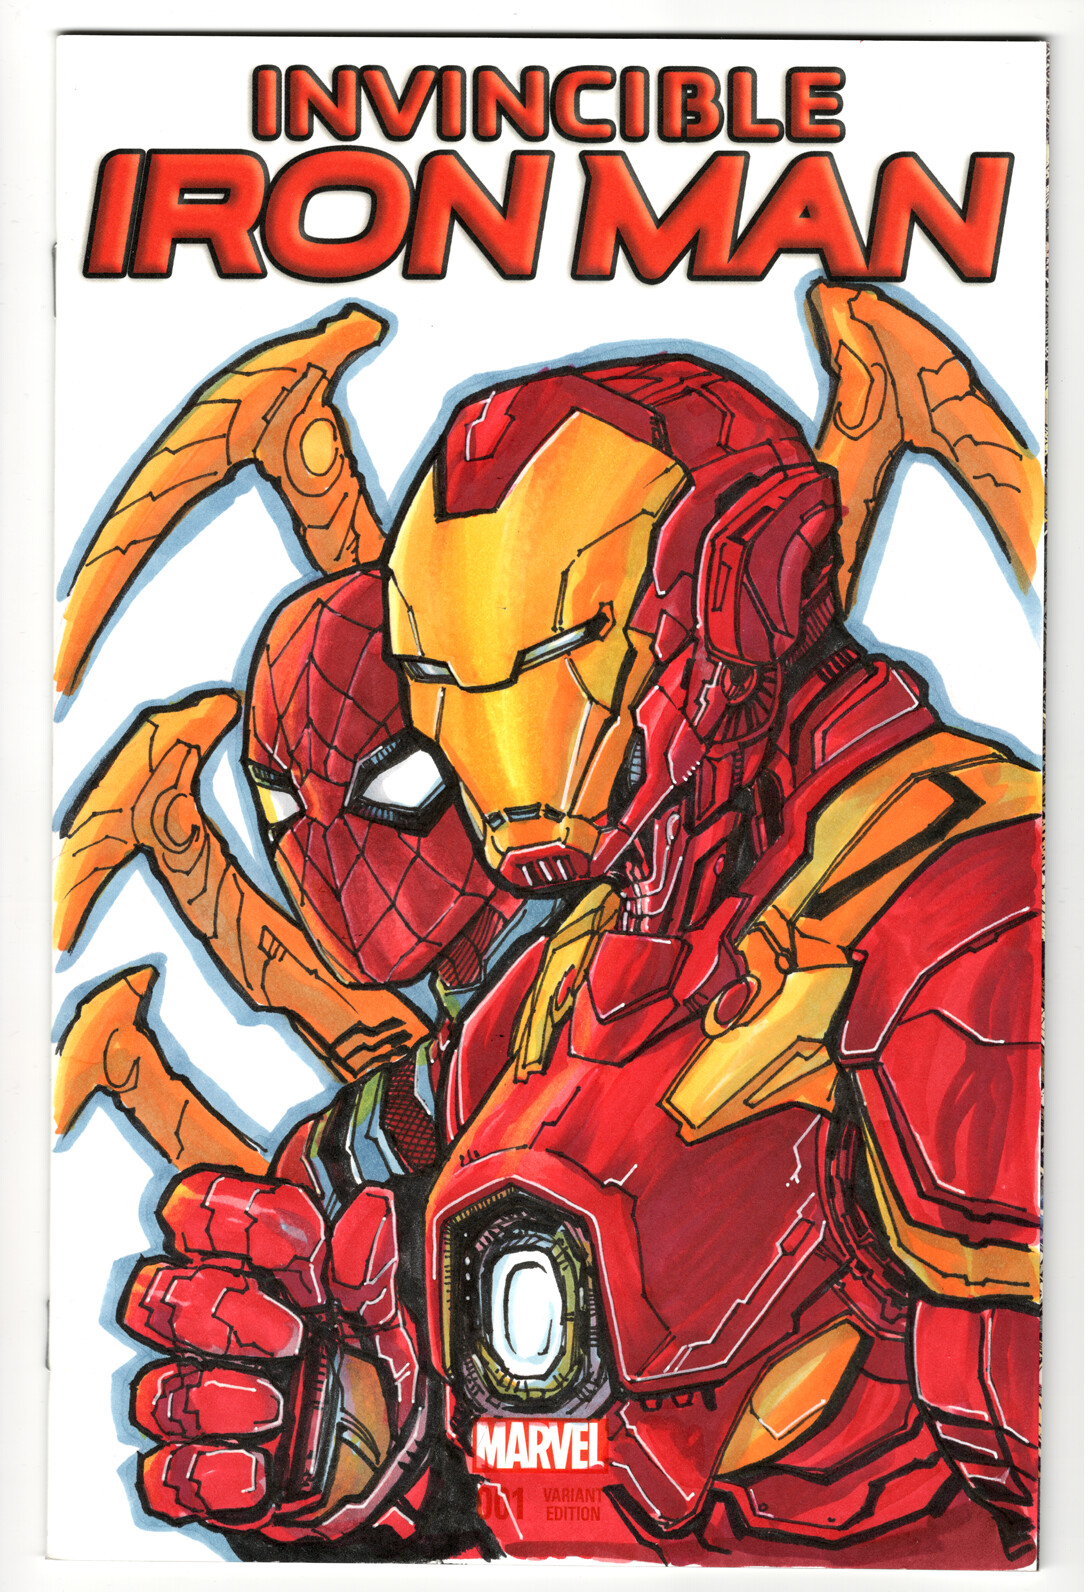 Loc nguyen 2019 05 16 invincible iron man